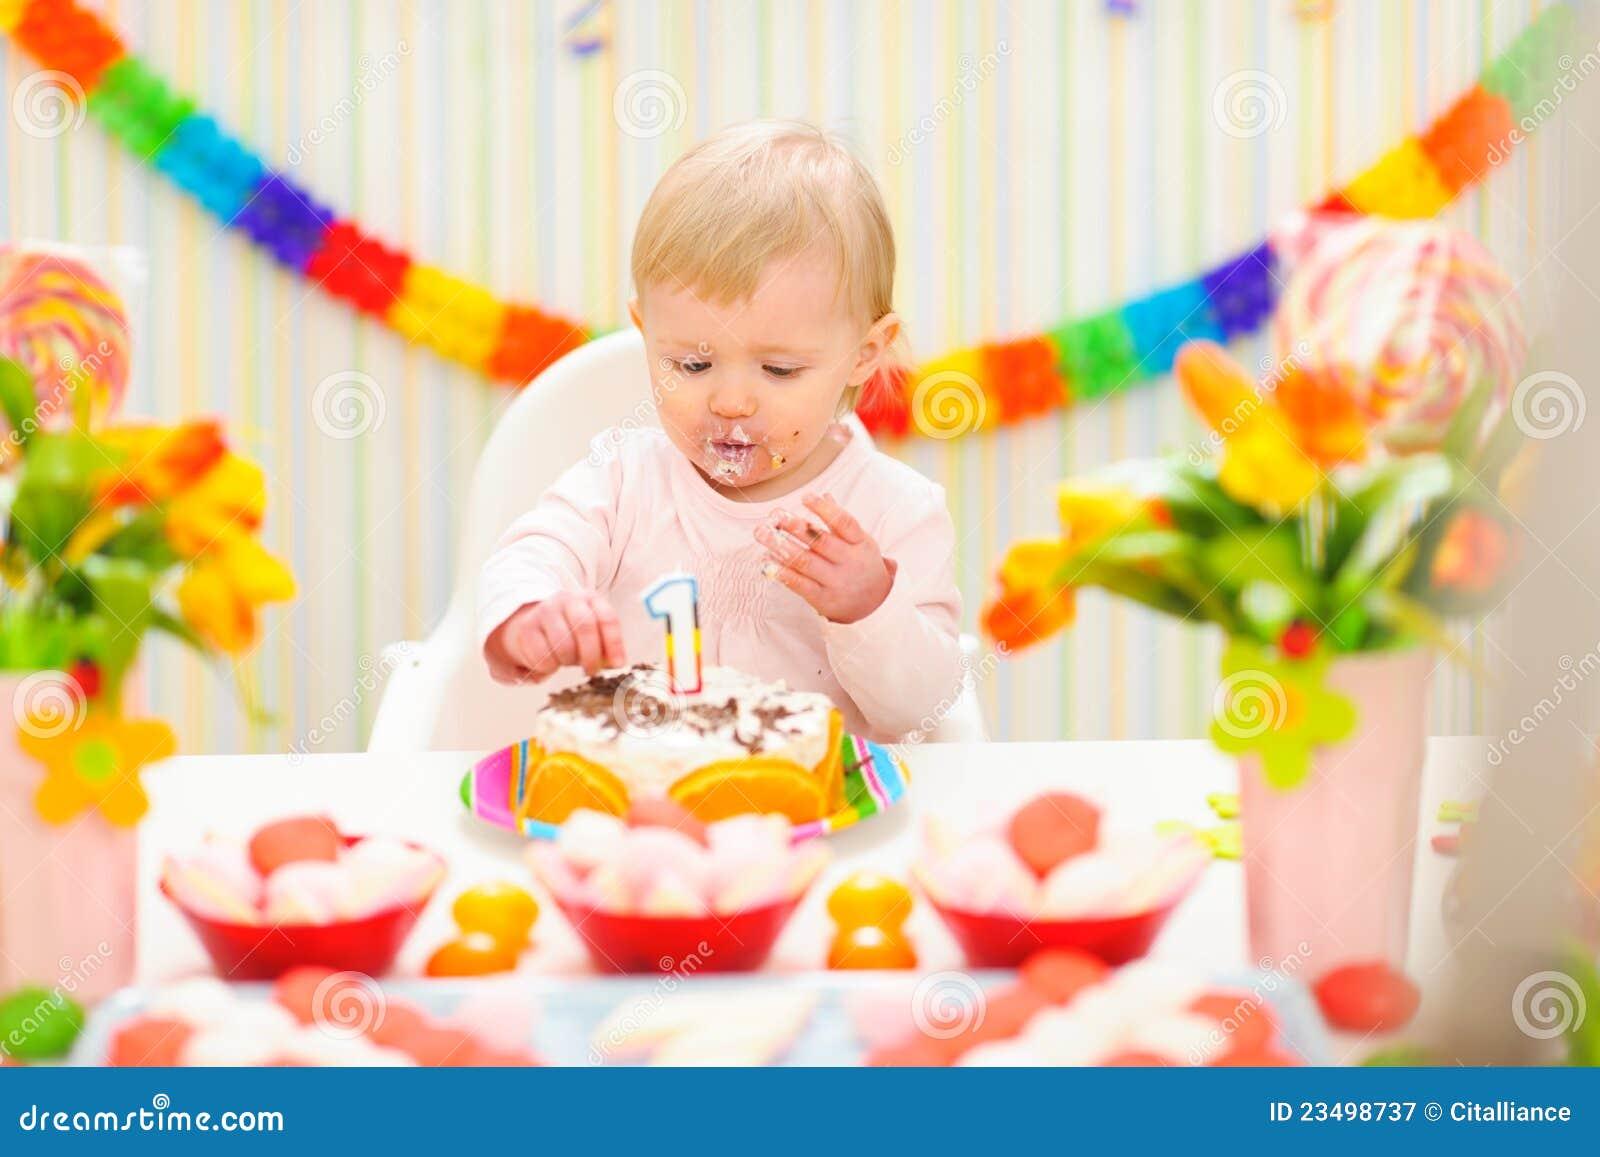 baby eating the birthday cake stock photo image 50926338 on images baby eating birthday cake